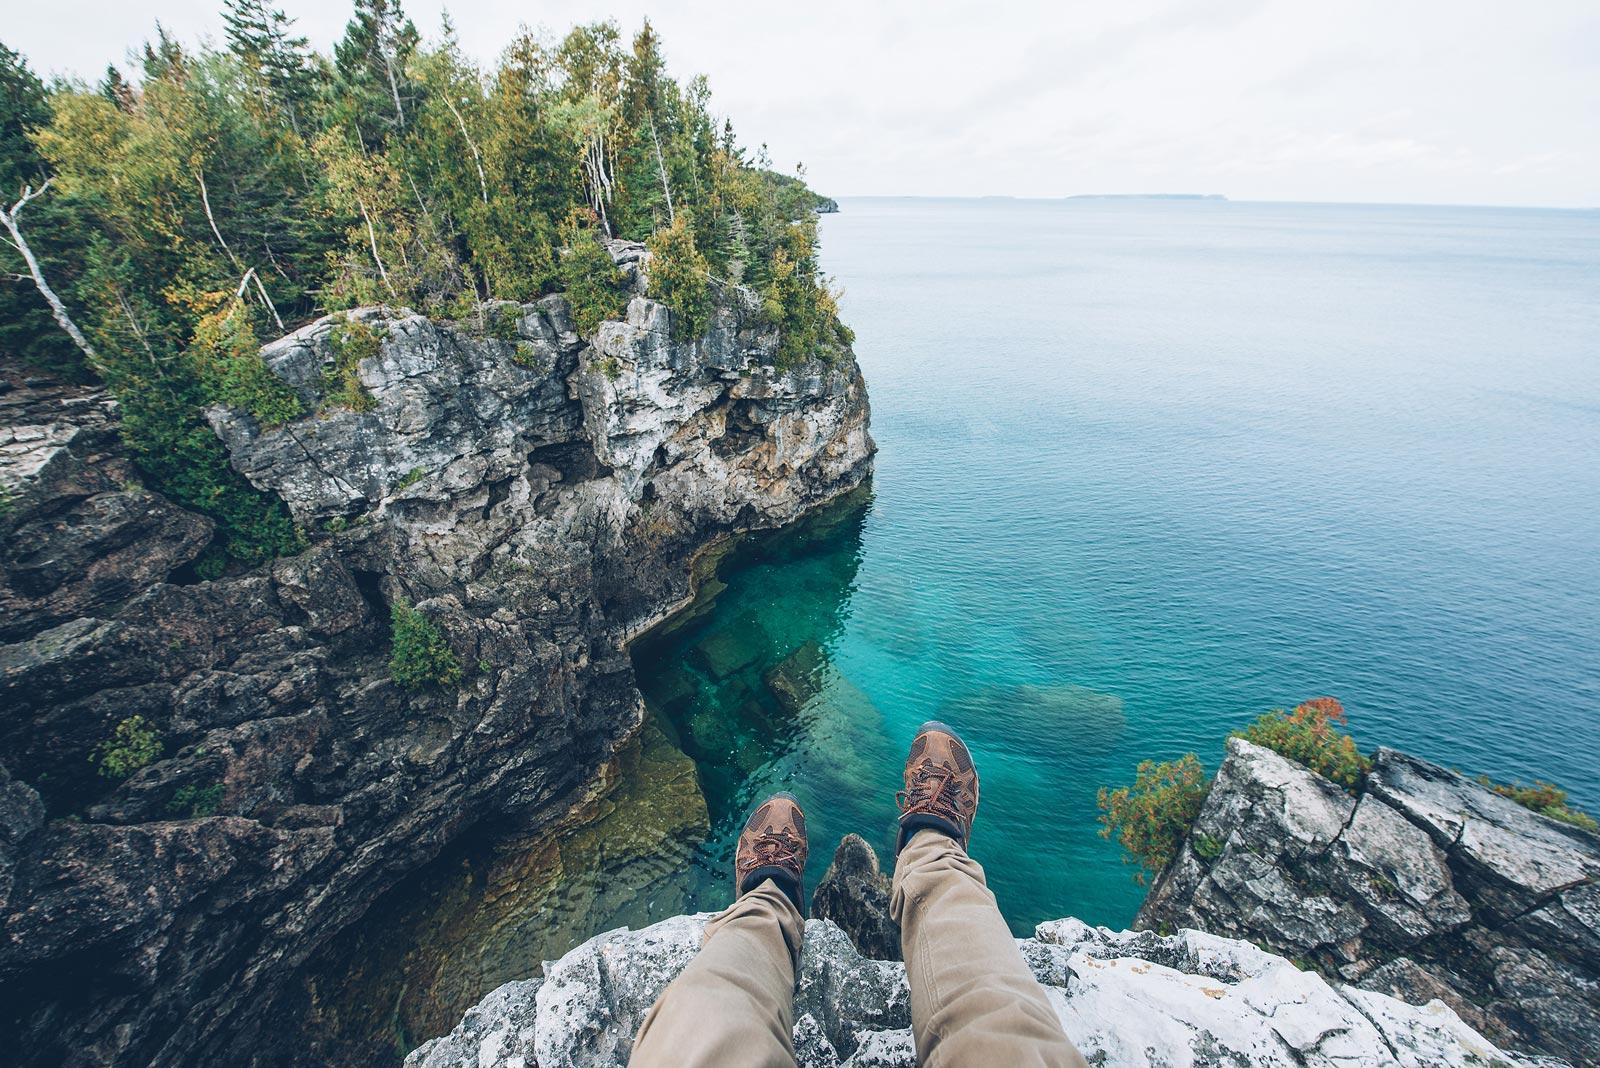 parc national péninsule de bruce grotto ontario